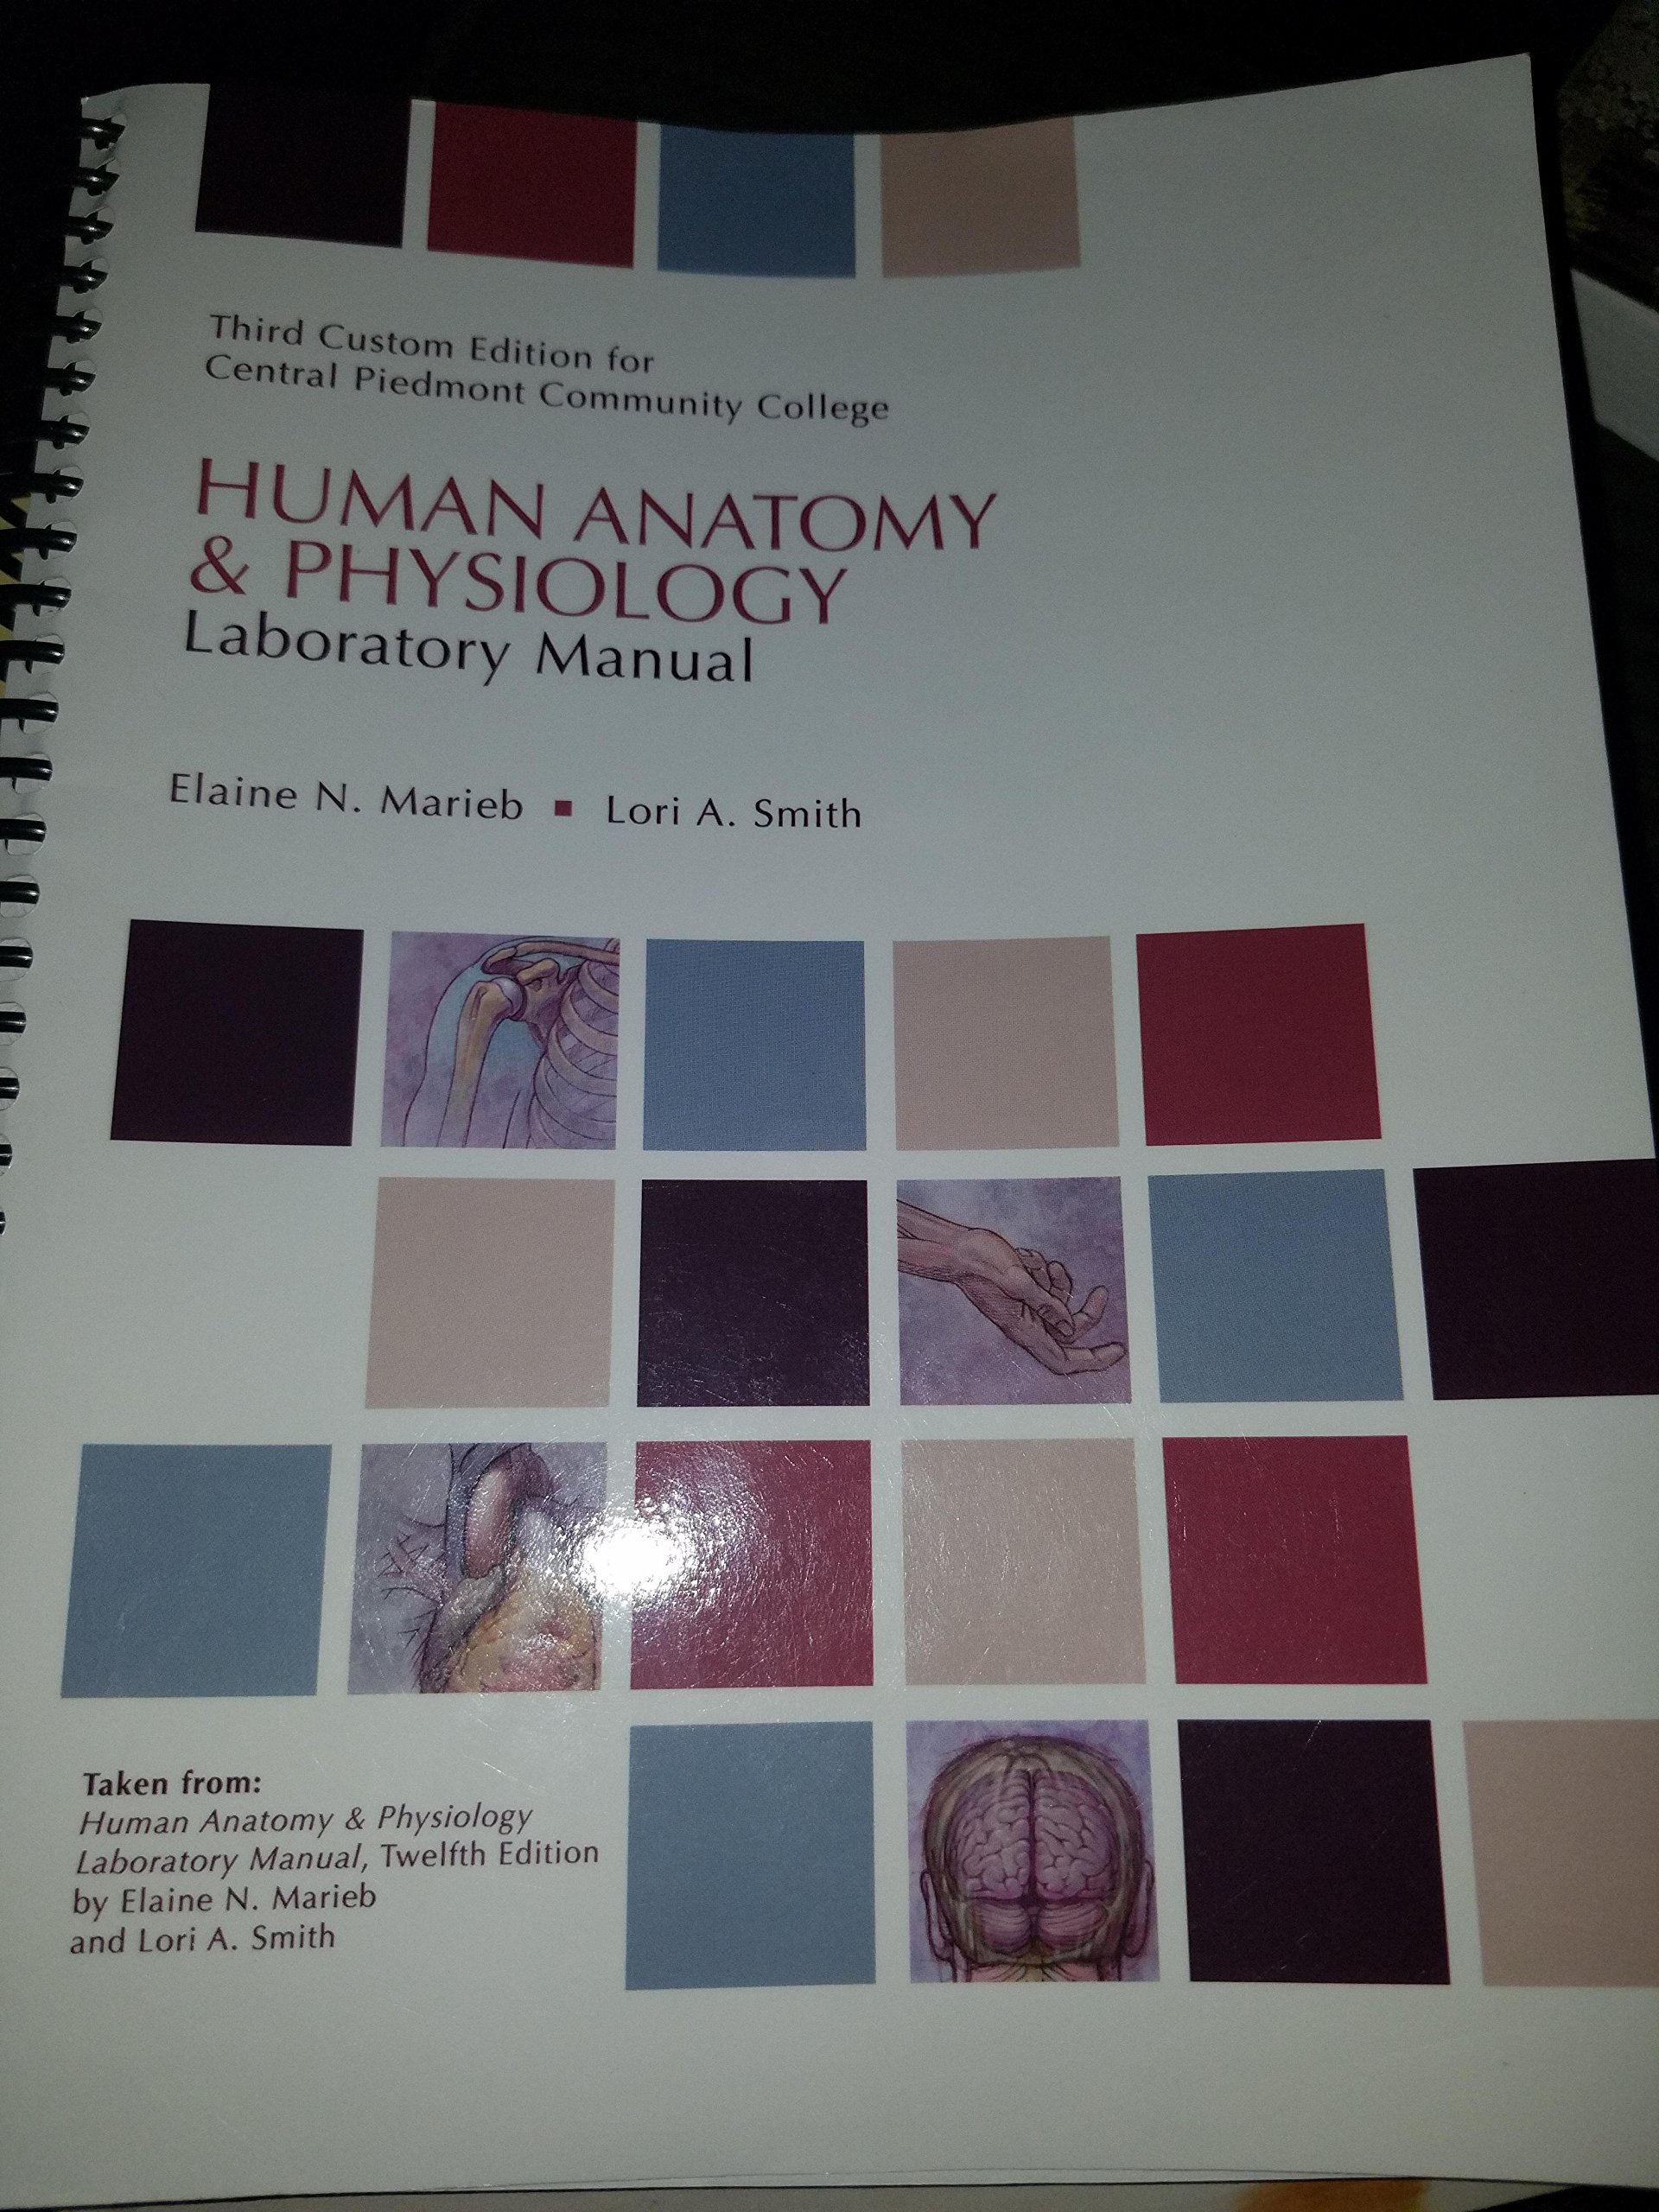 Human Anatomy & Physiology Laboratory Manual Third Custom Edition ...